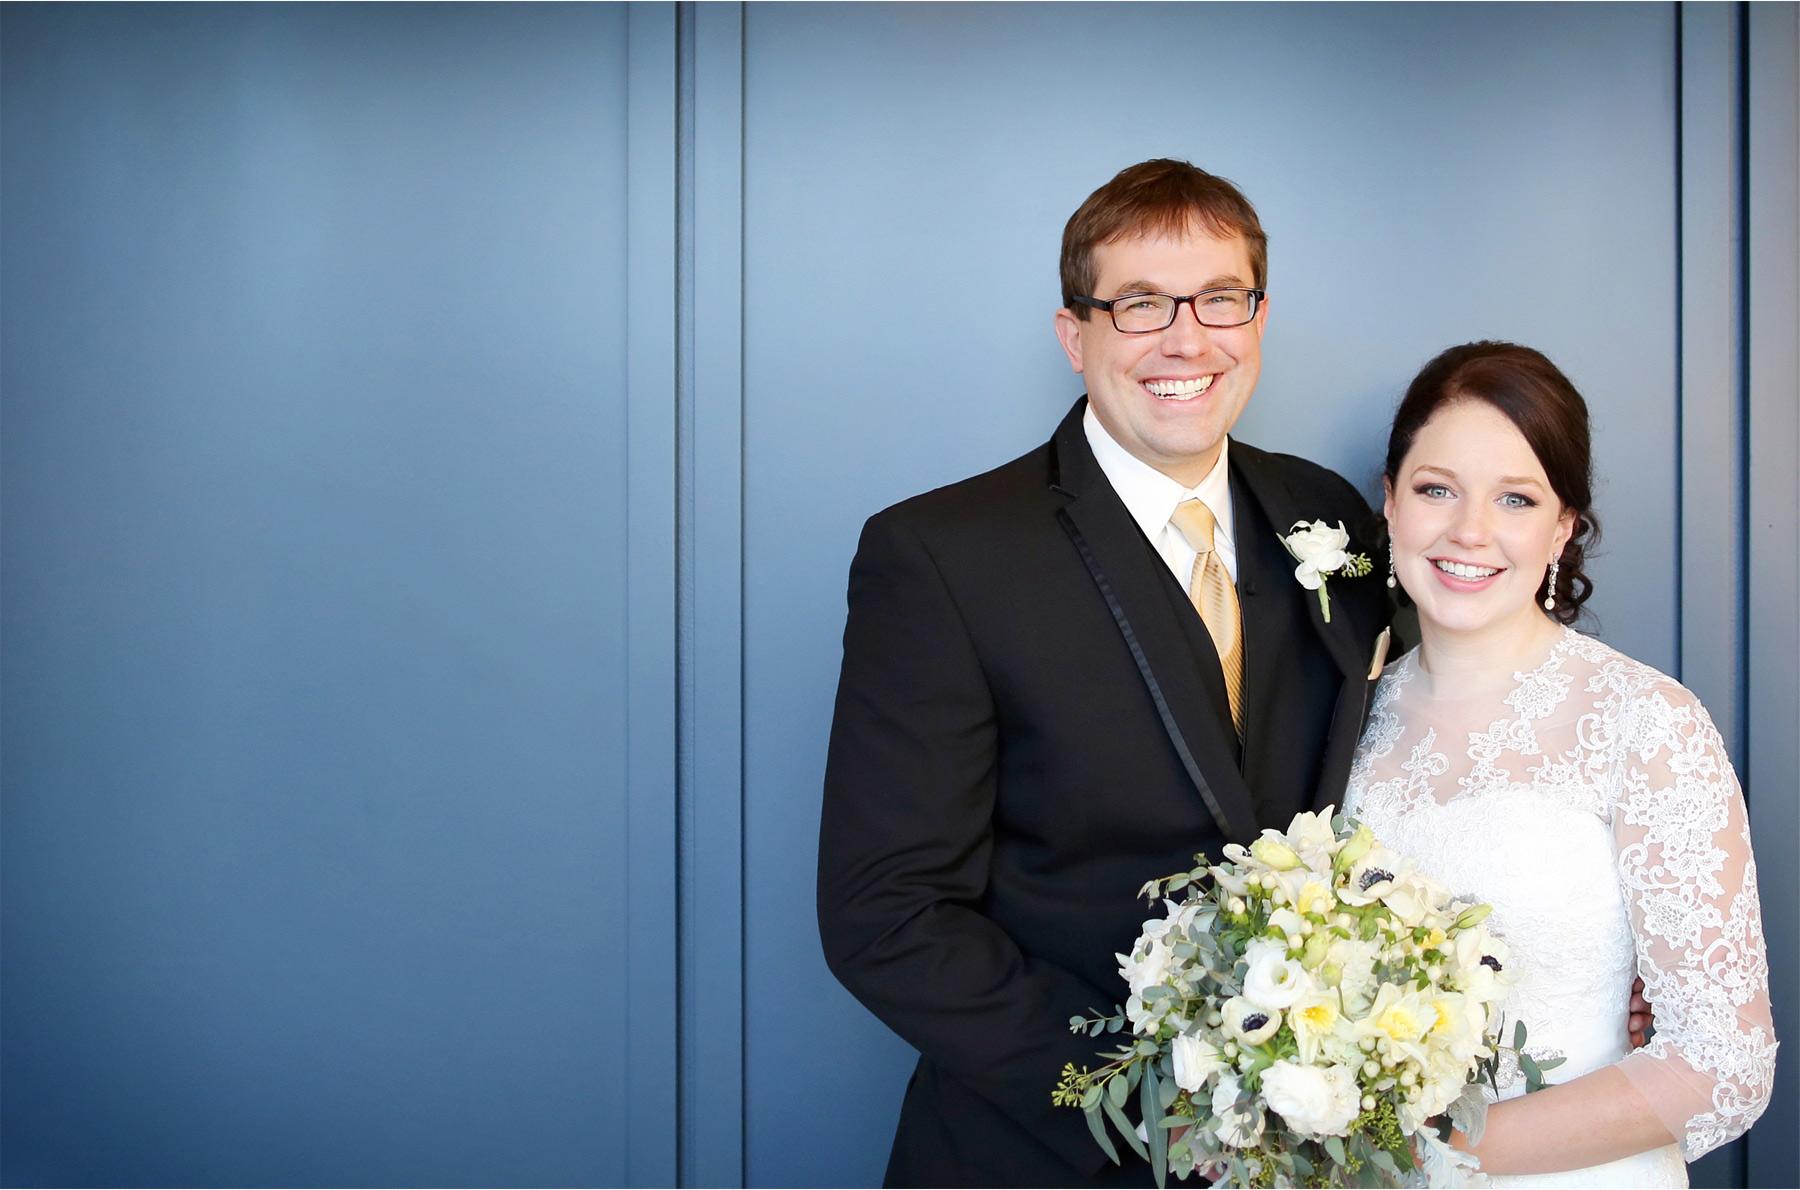 06-Minneapolis-Minnesota-Wedding-Photographer-by-Andrew-Vick-Photography-Winter-Renaissance-Hotel-First-Meeting-Look-Bride-Groom-Flowers-Sara-and-Rob.jpg